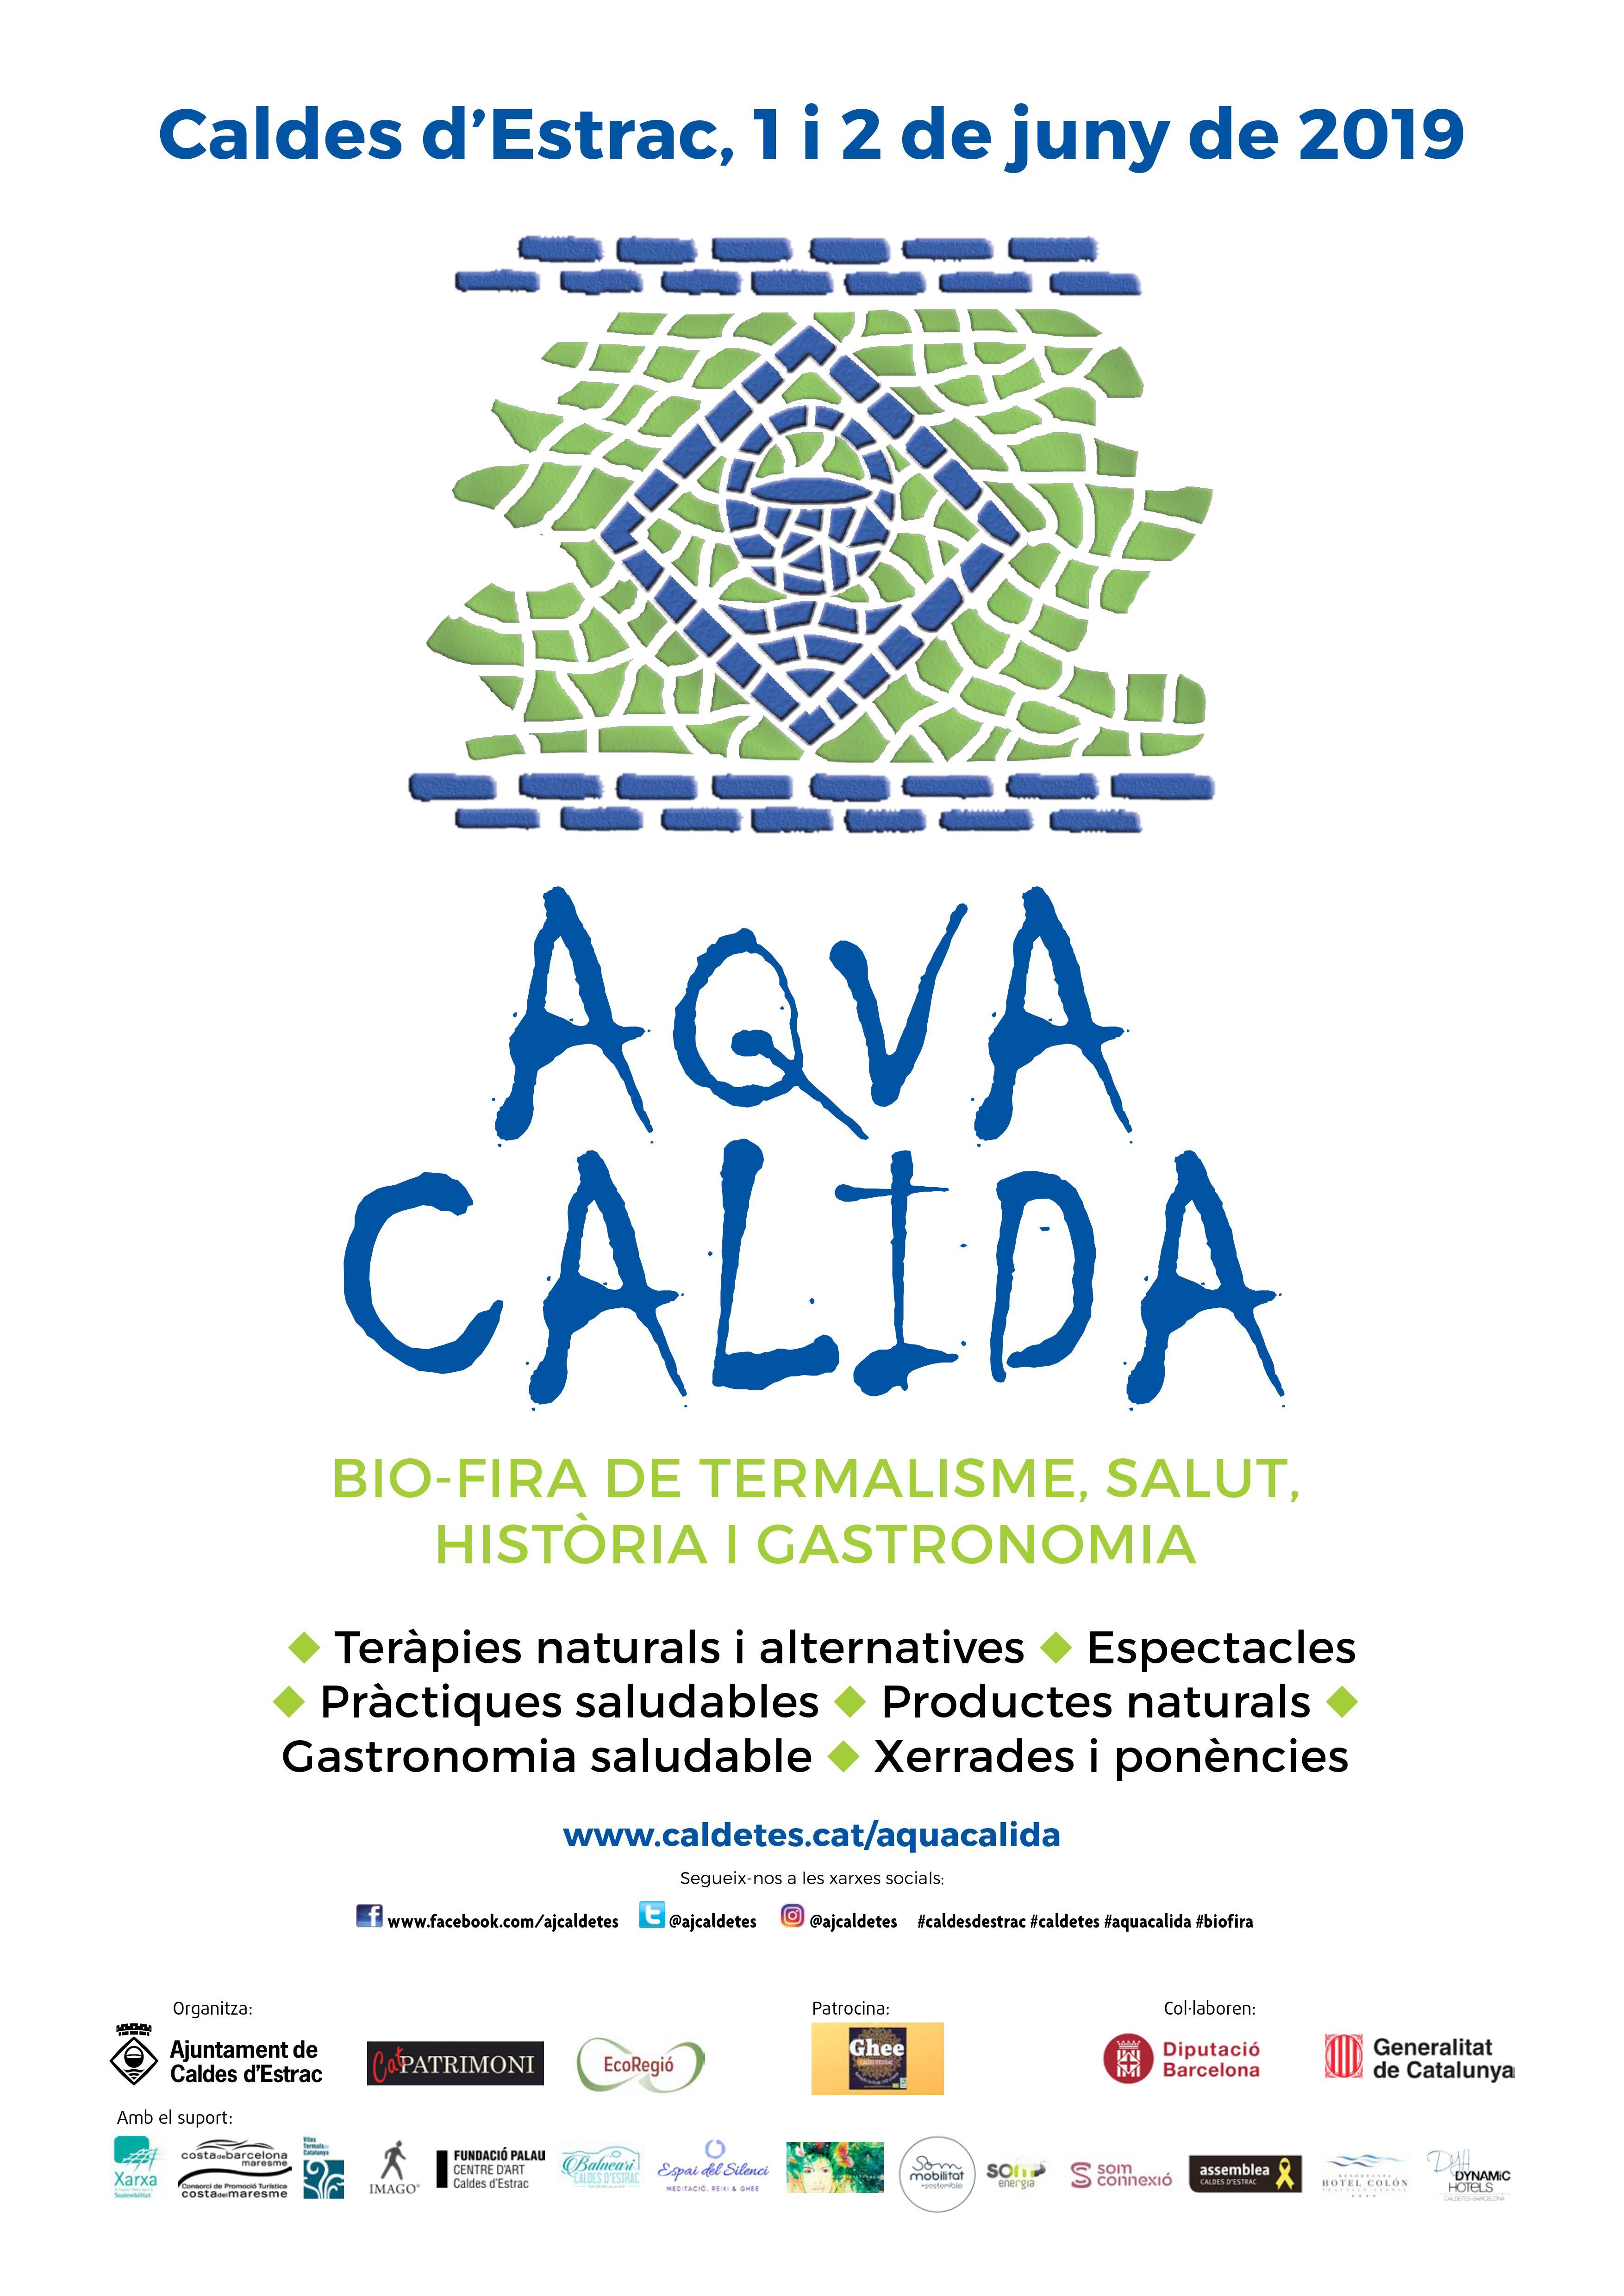 http://www.caldetes.cat/ARXIUS/2019/promocio_turisme/aqua_calida/aquacalida.jpg